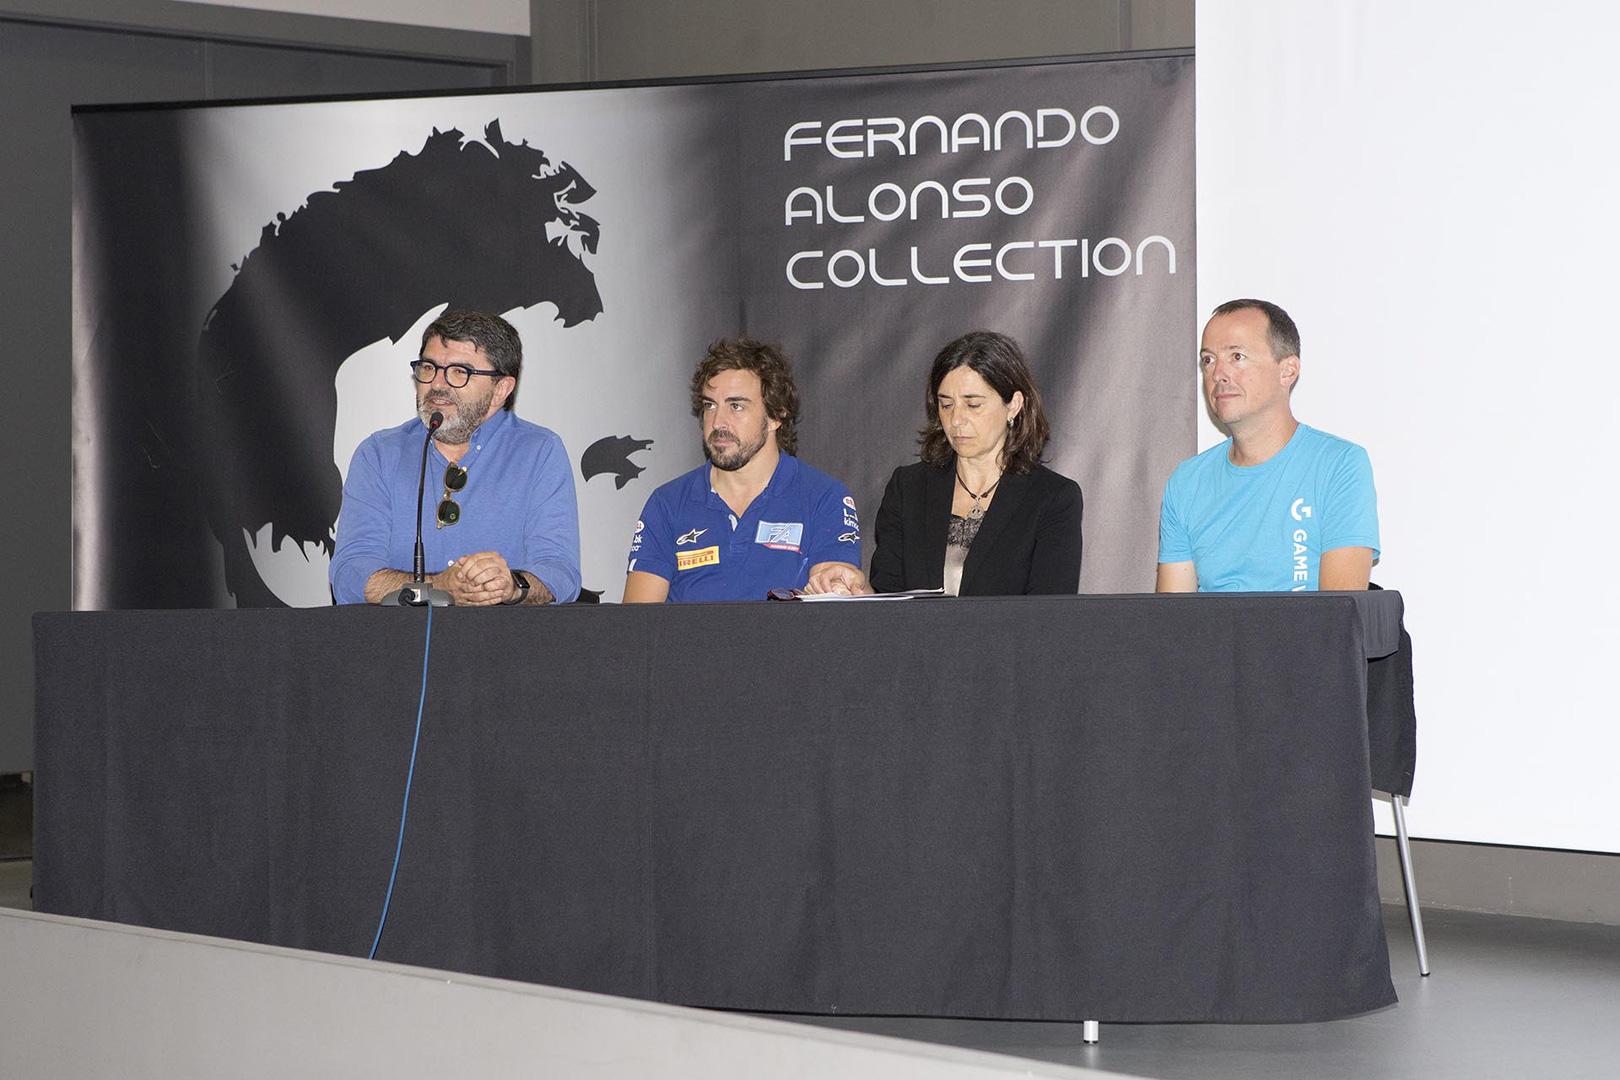 http://www.idgtv.es/archivos/201807/fernando-alonso-liberbank-challenge-img2.jpg